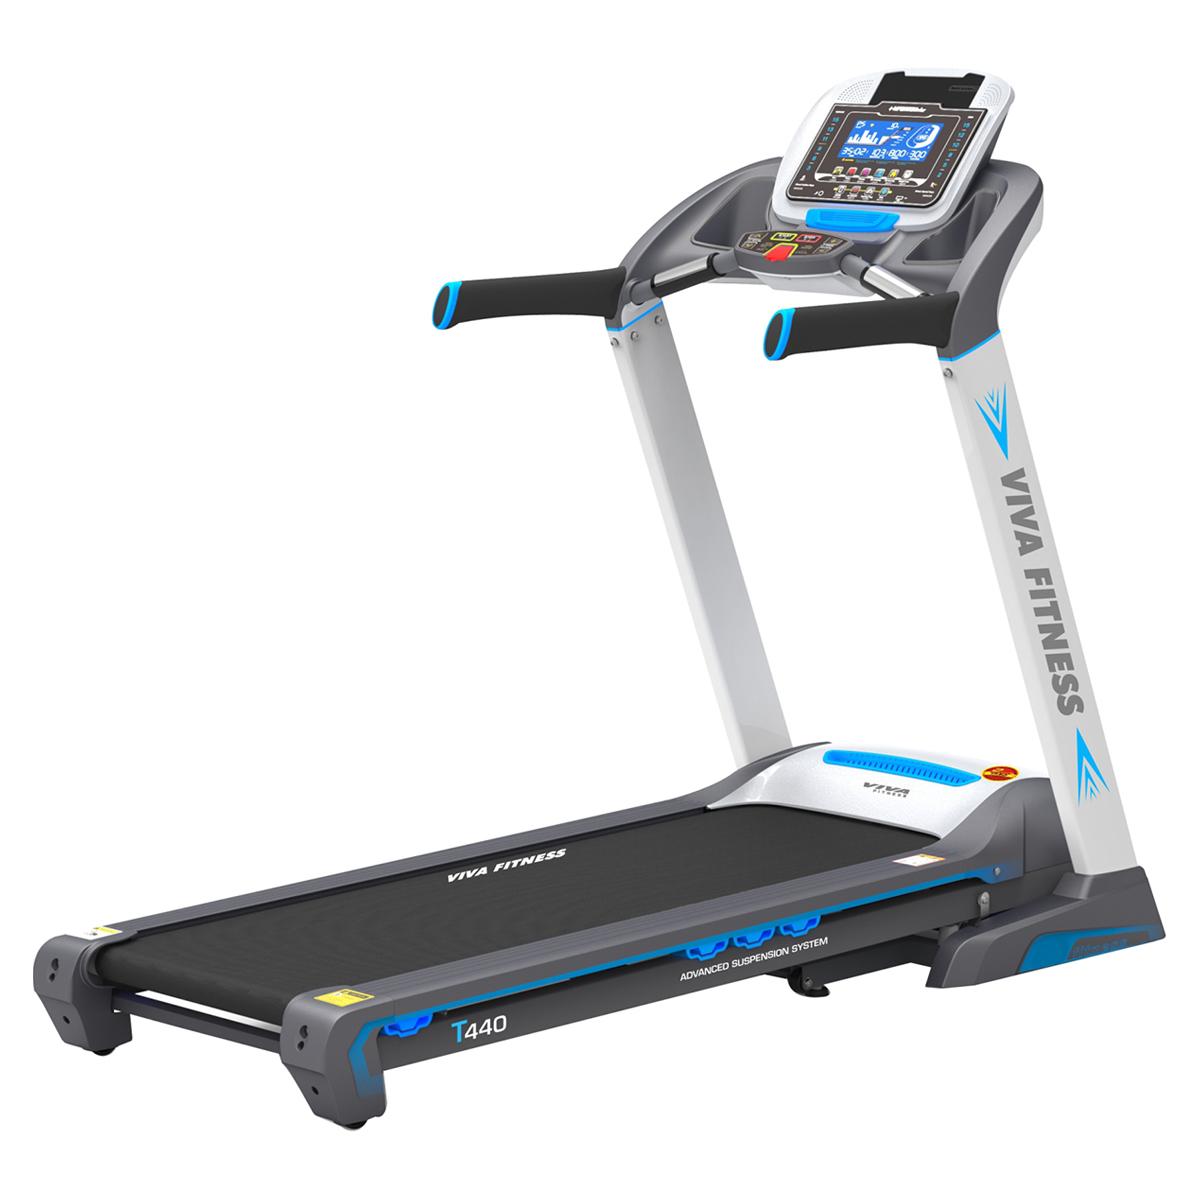 T-440 Motorized Treadmill